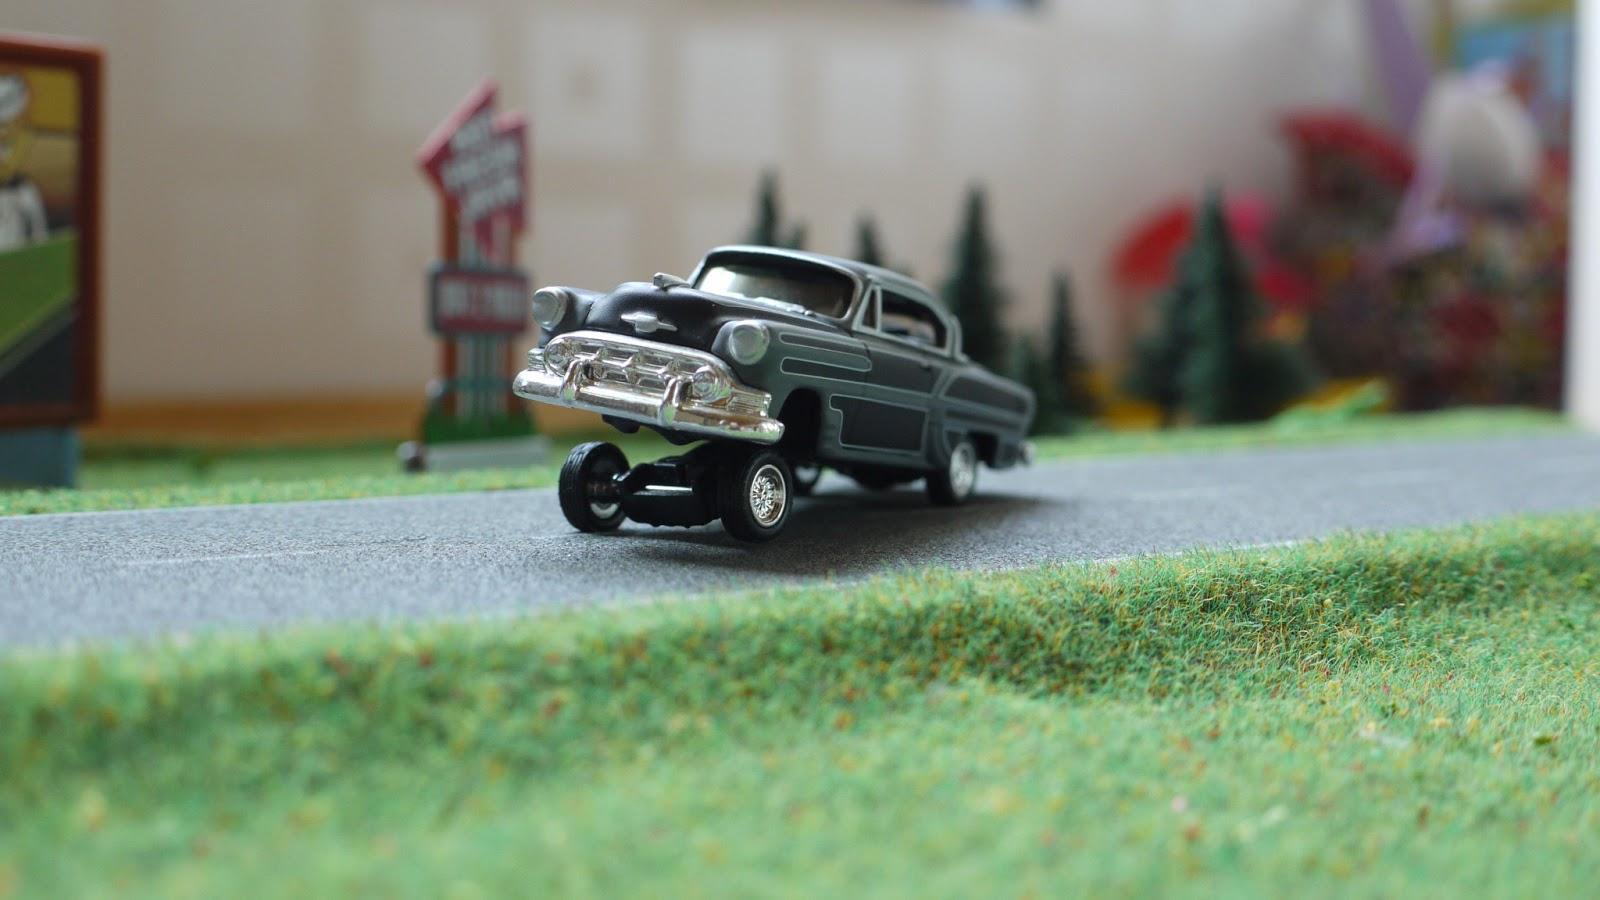 Diecast Cars 1 64 Modellautos 164 Modellbilar Chevrolet Bel 1954 Chevy Impala Lowrider Air Custom M2machines